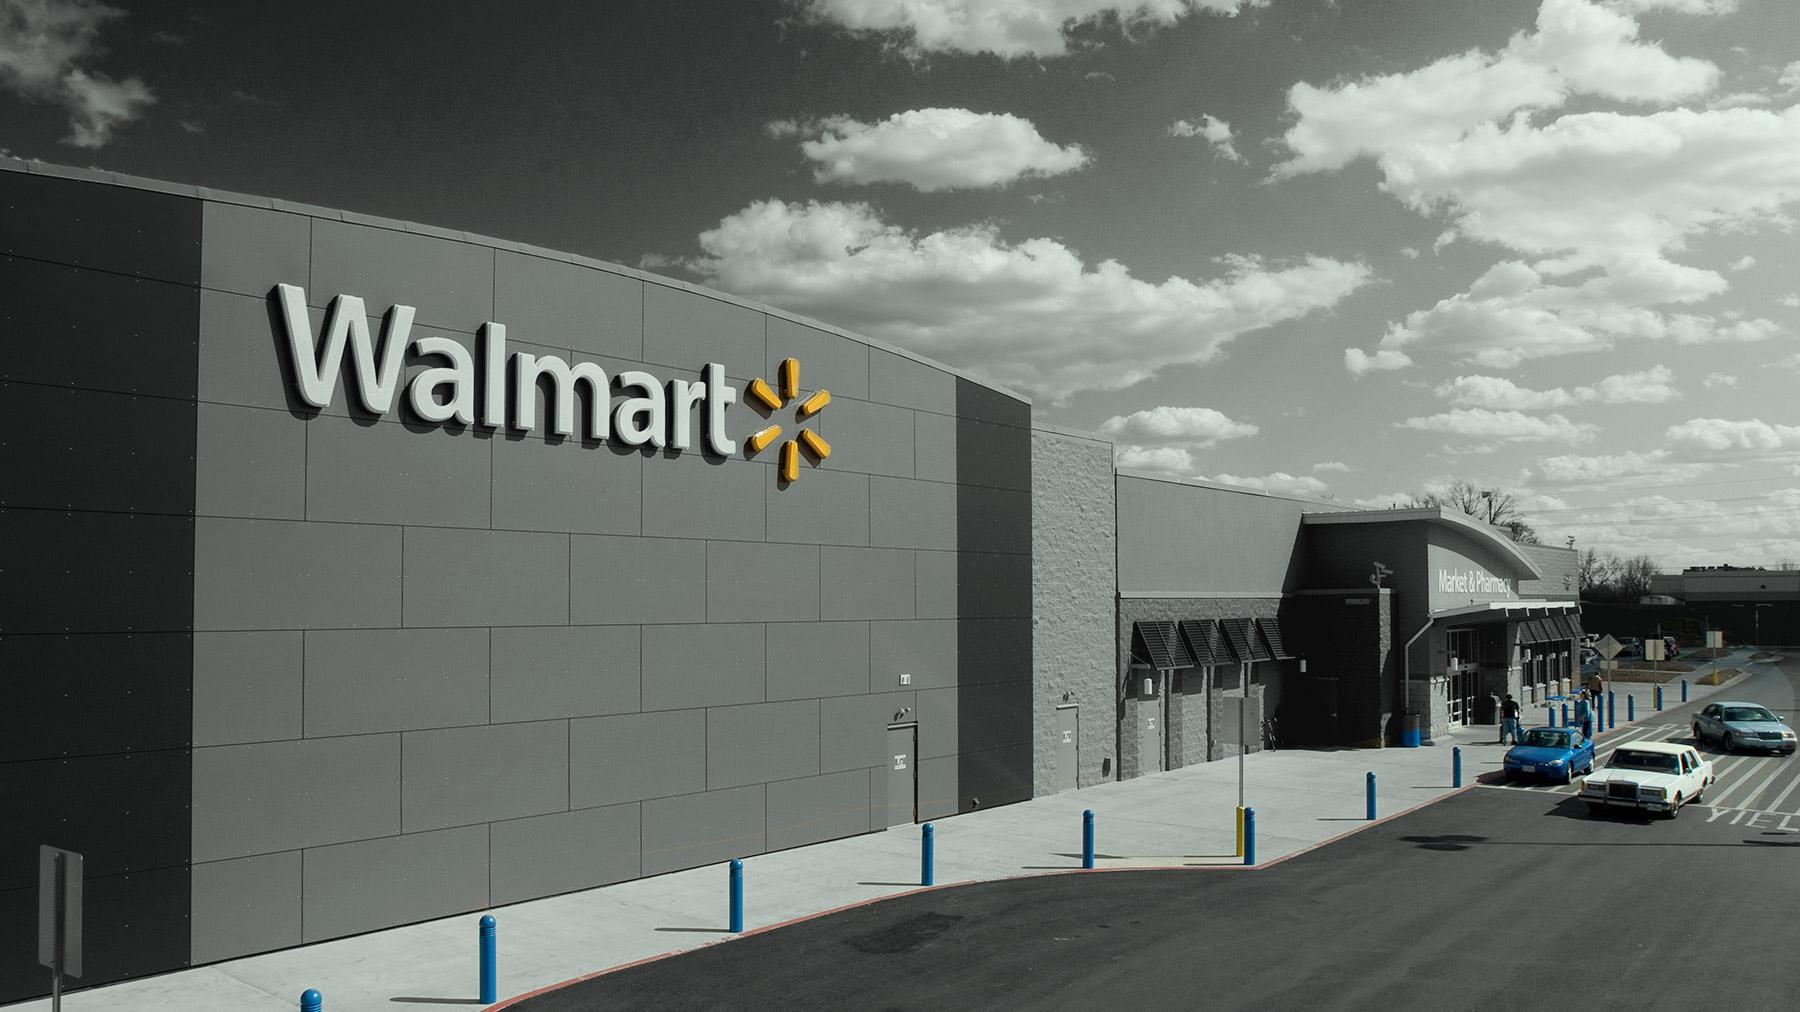 wallmart-slide-bg